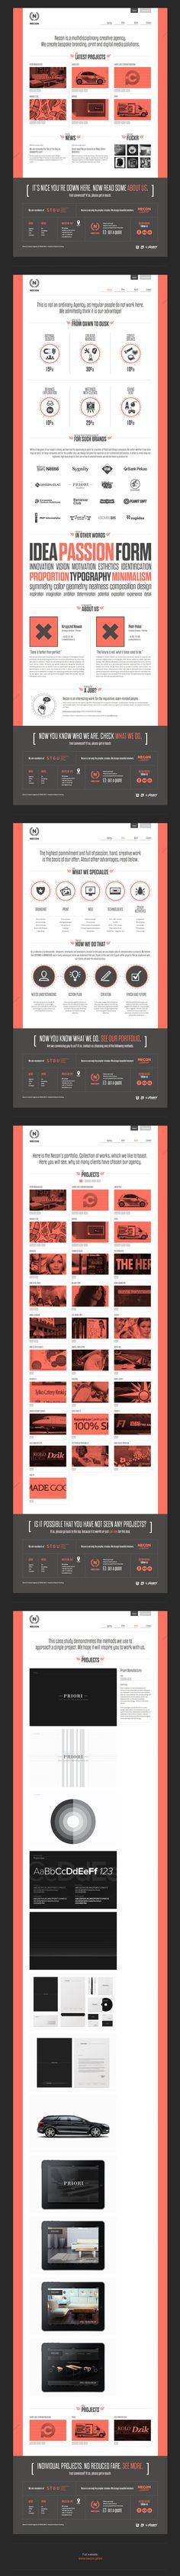 Necon Creative Agency - Website / Necon